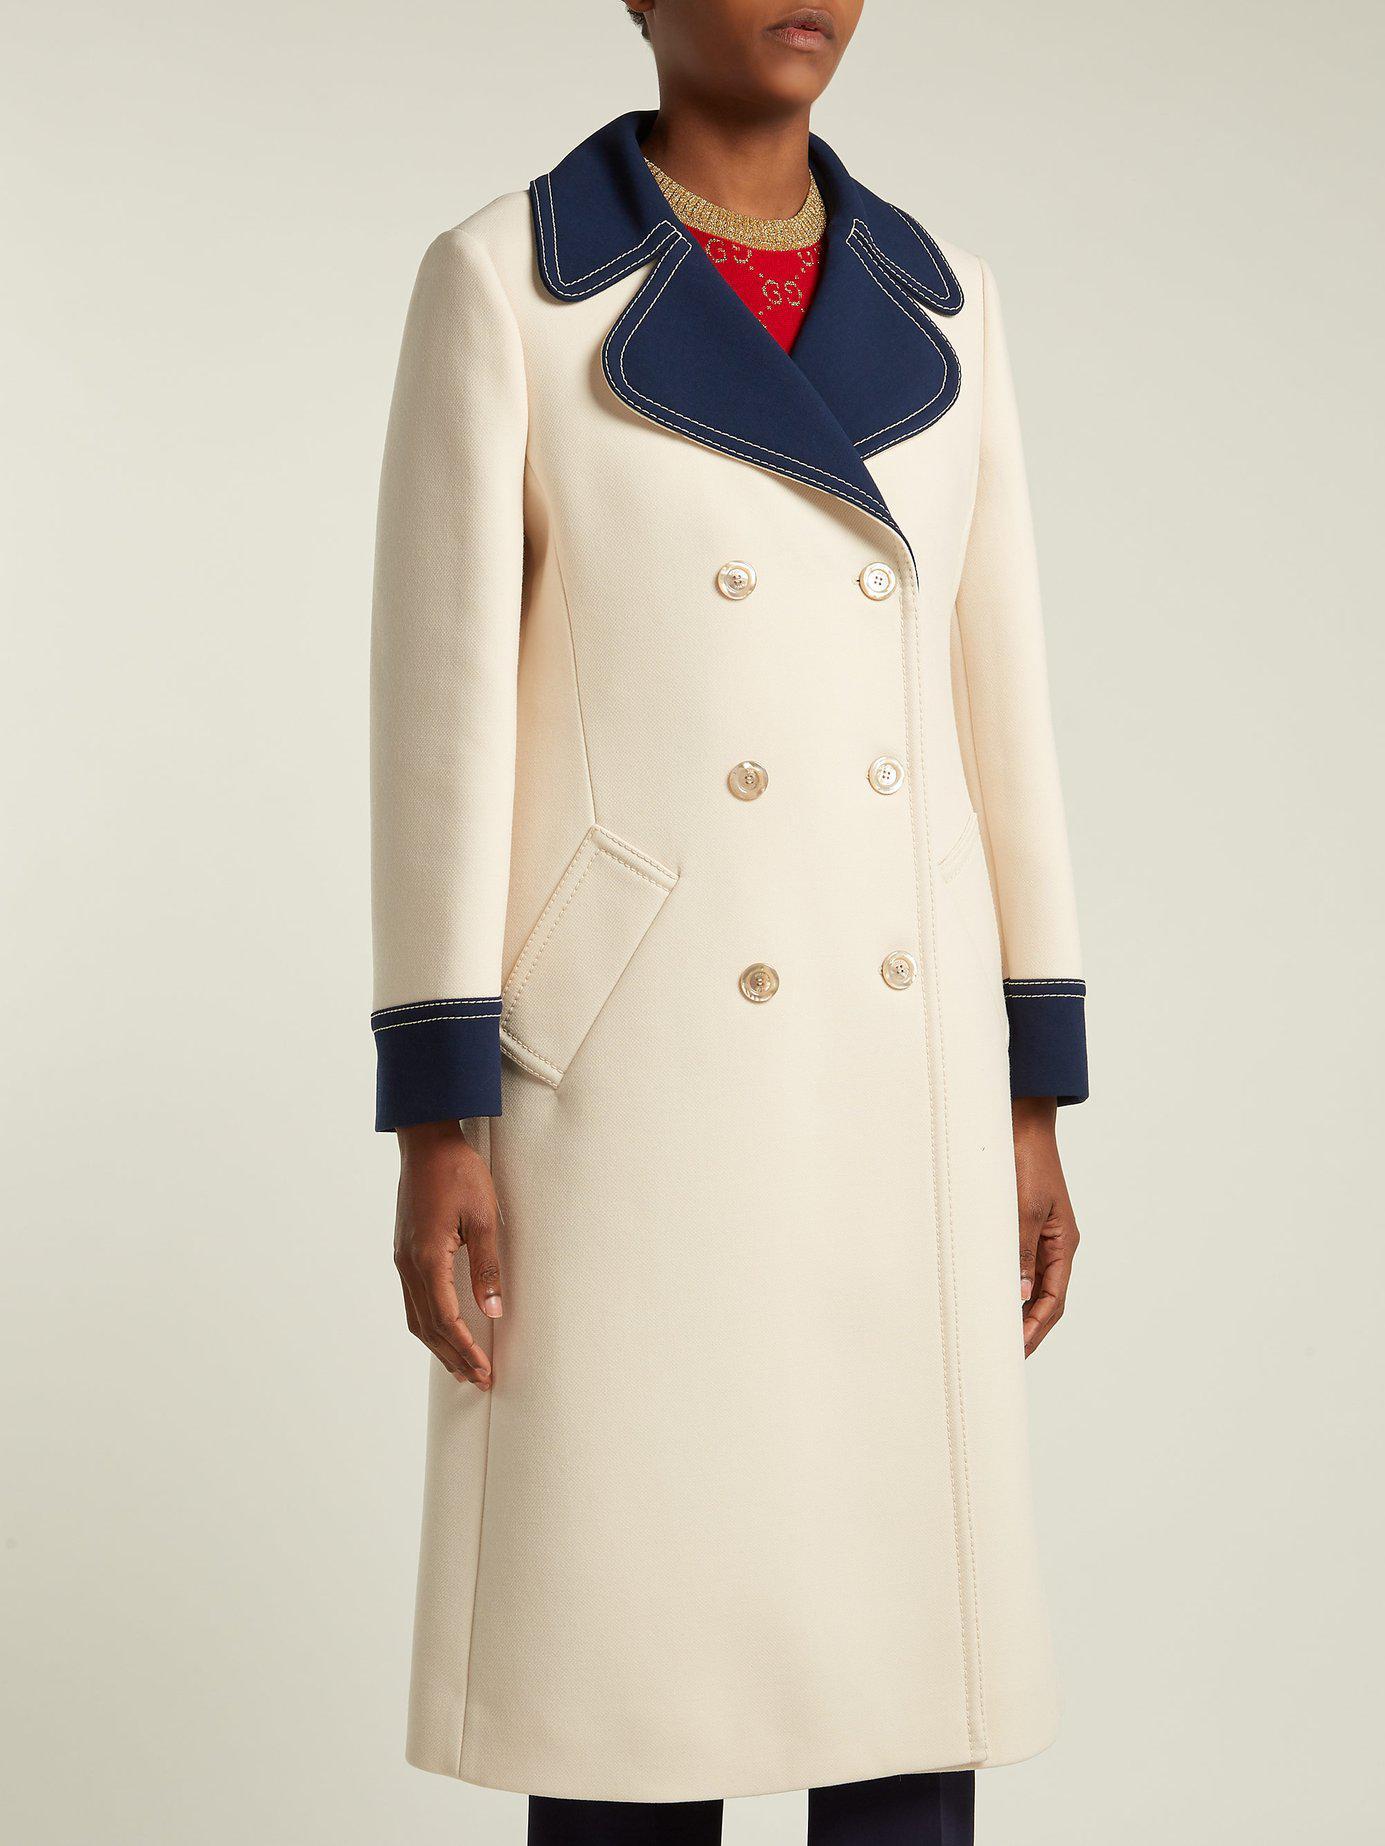 cc682123869cd Gucci - White Gardenia Wool Coat - Lyst. View fullscreen